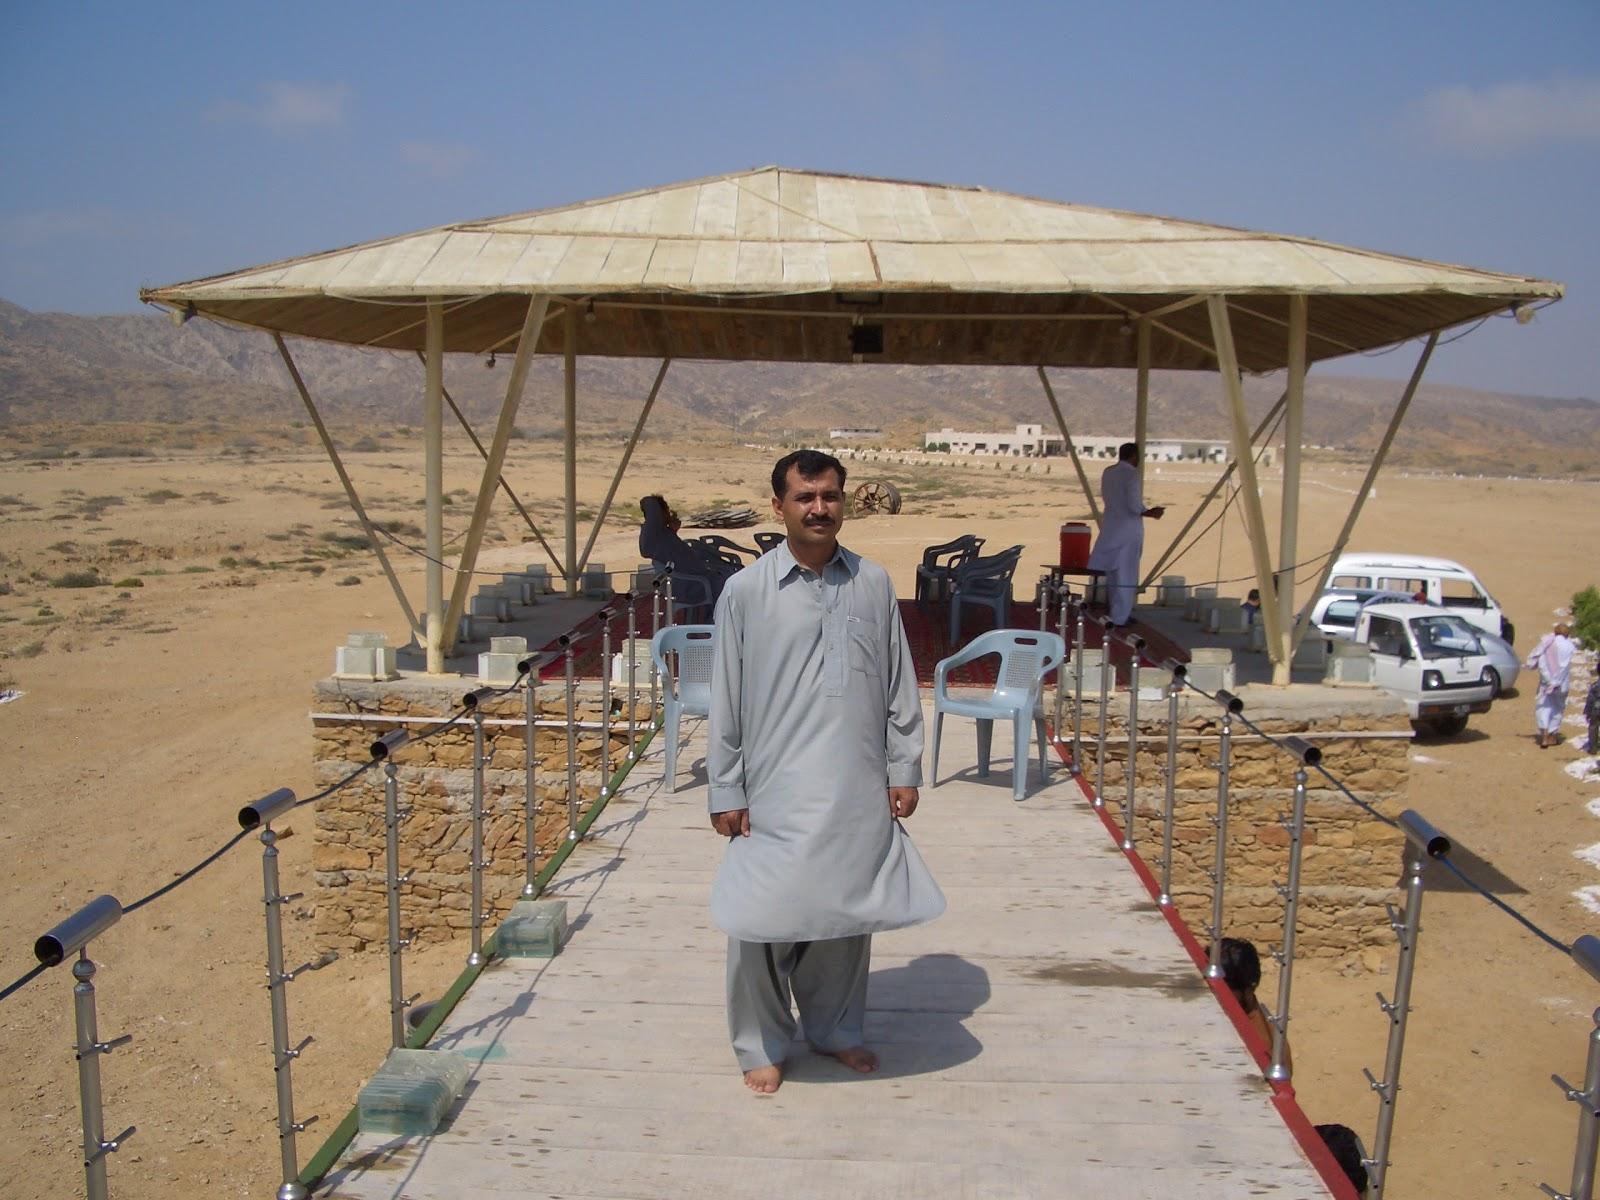 http://2.bp.blogspot.com/-cfu5722Yd24/UHsFupS6WtI/AAAAAAAABJo/CpQOm6Y-9m0/s1600/Free-Nature-wallpaper-image-of-Natiagalli-Karachi-hut-sea-side-Pakistan.JPG